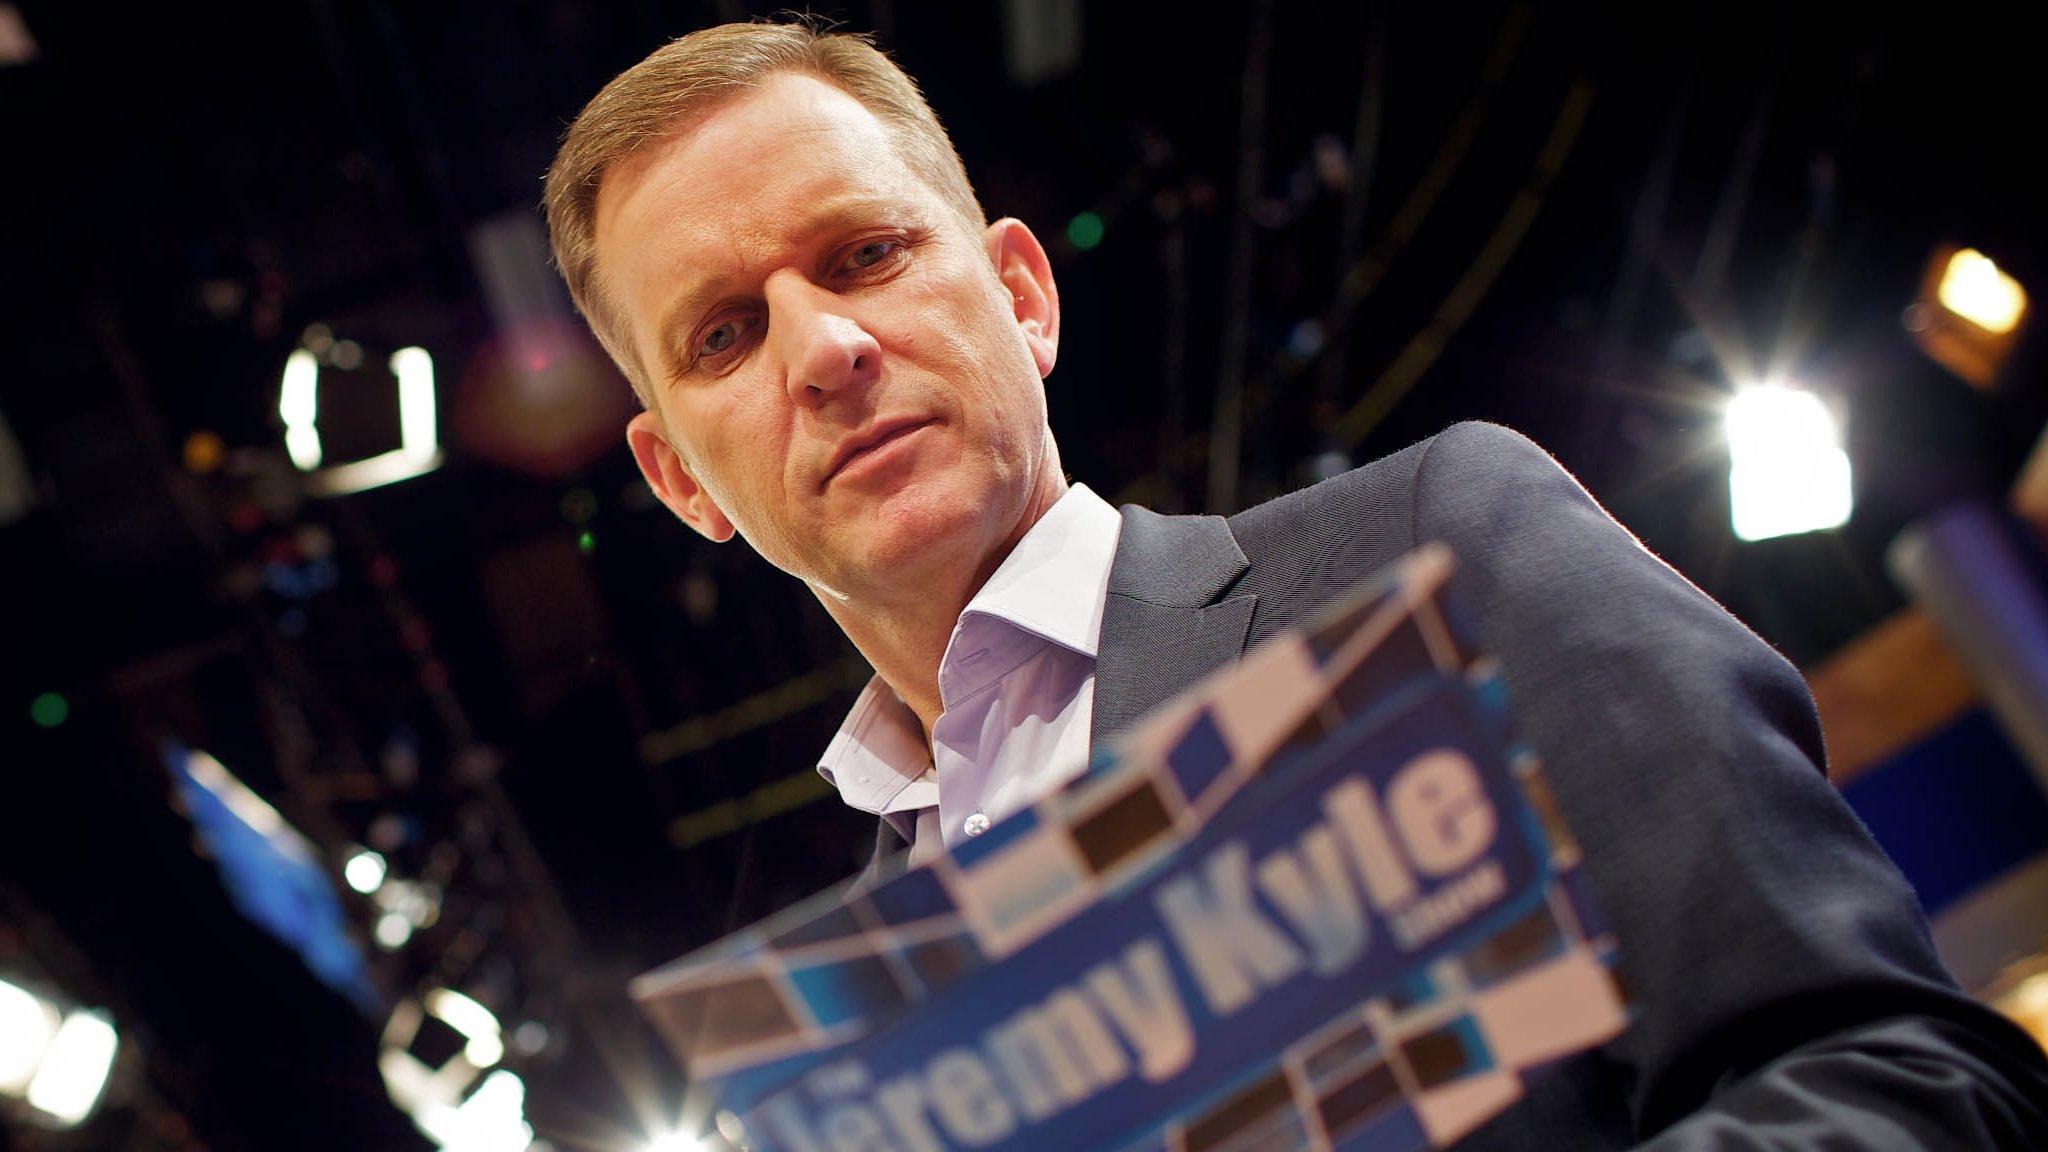 Jeremy Kyle Show: MPs criticise 'irresponsible' ITV over lie detectors